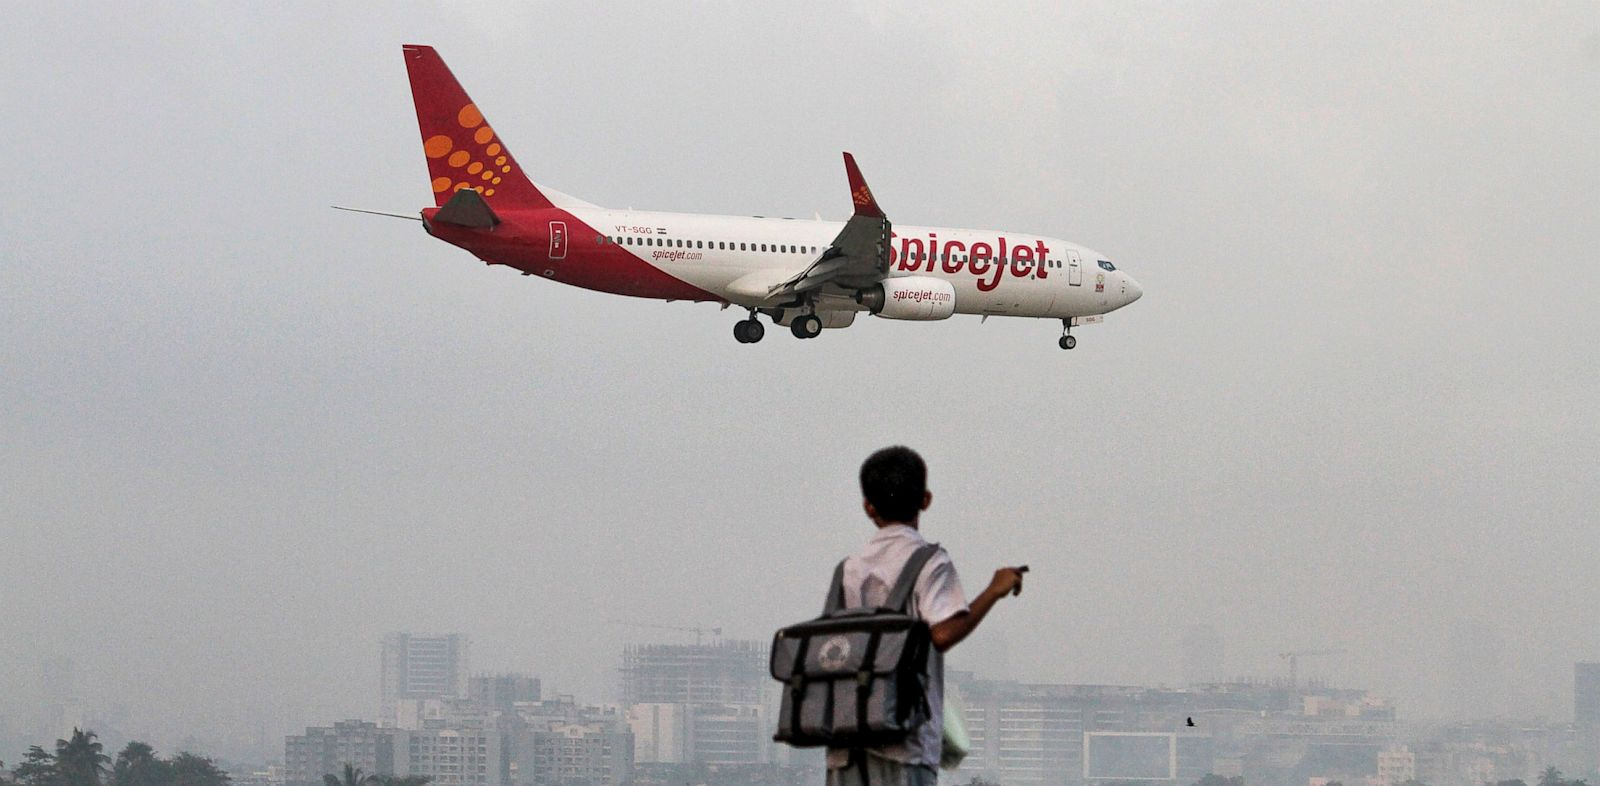 PHOTO: A SpiceJet Ltd. aircraft prepares to land at Chhatrapati Shivaji International Airport in Mumbai, India, Sept. 17, 2012.